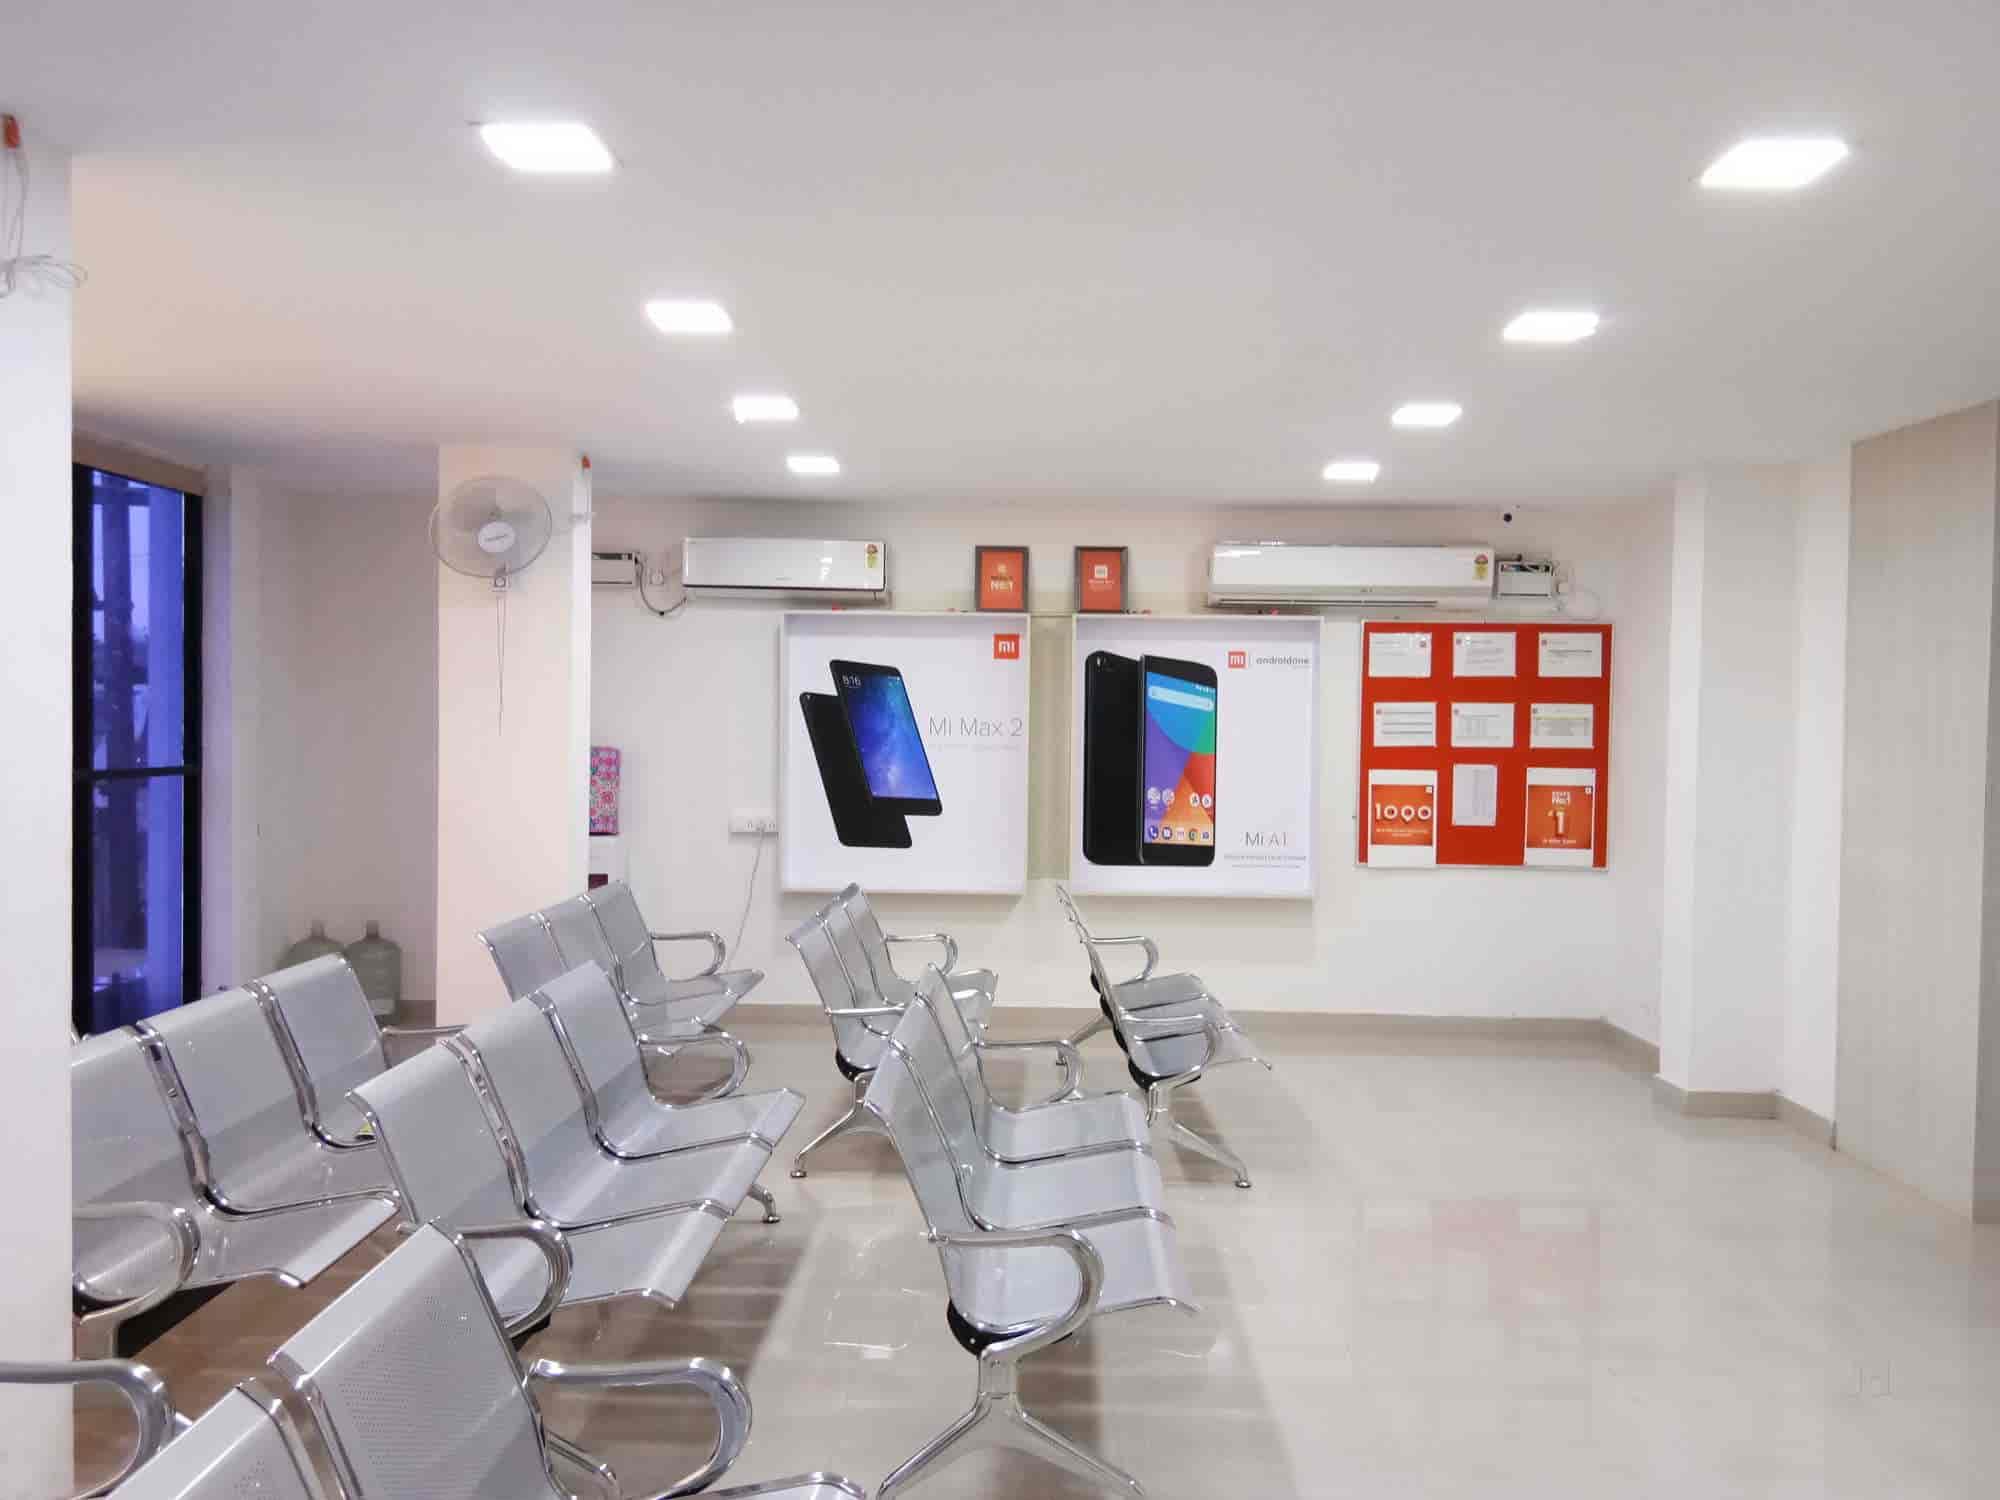 Mi Authorized Service Center, Thillai Nagar - Mobile Phone